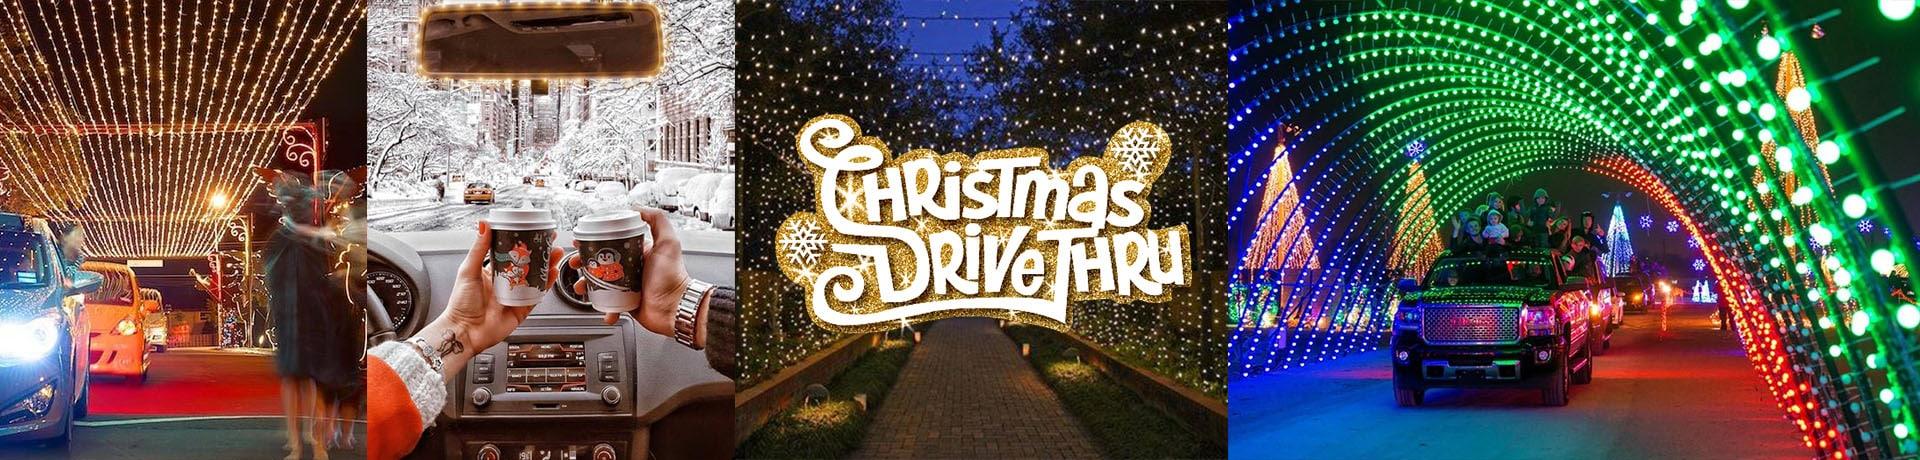 Christmas Drive-Thru sfeerbeeld 2021